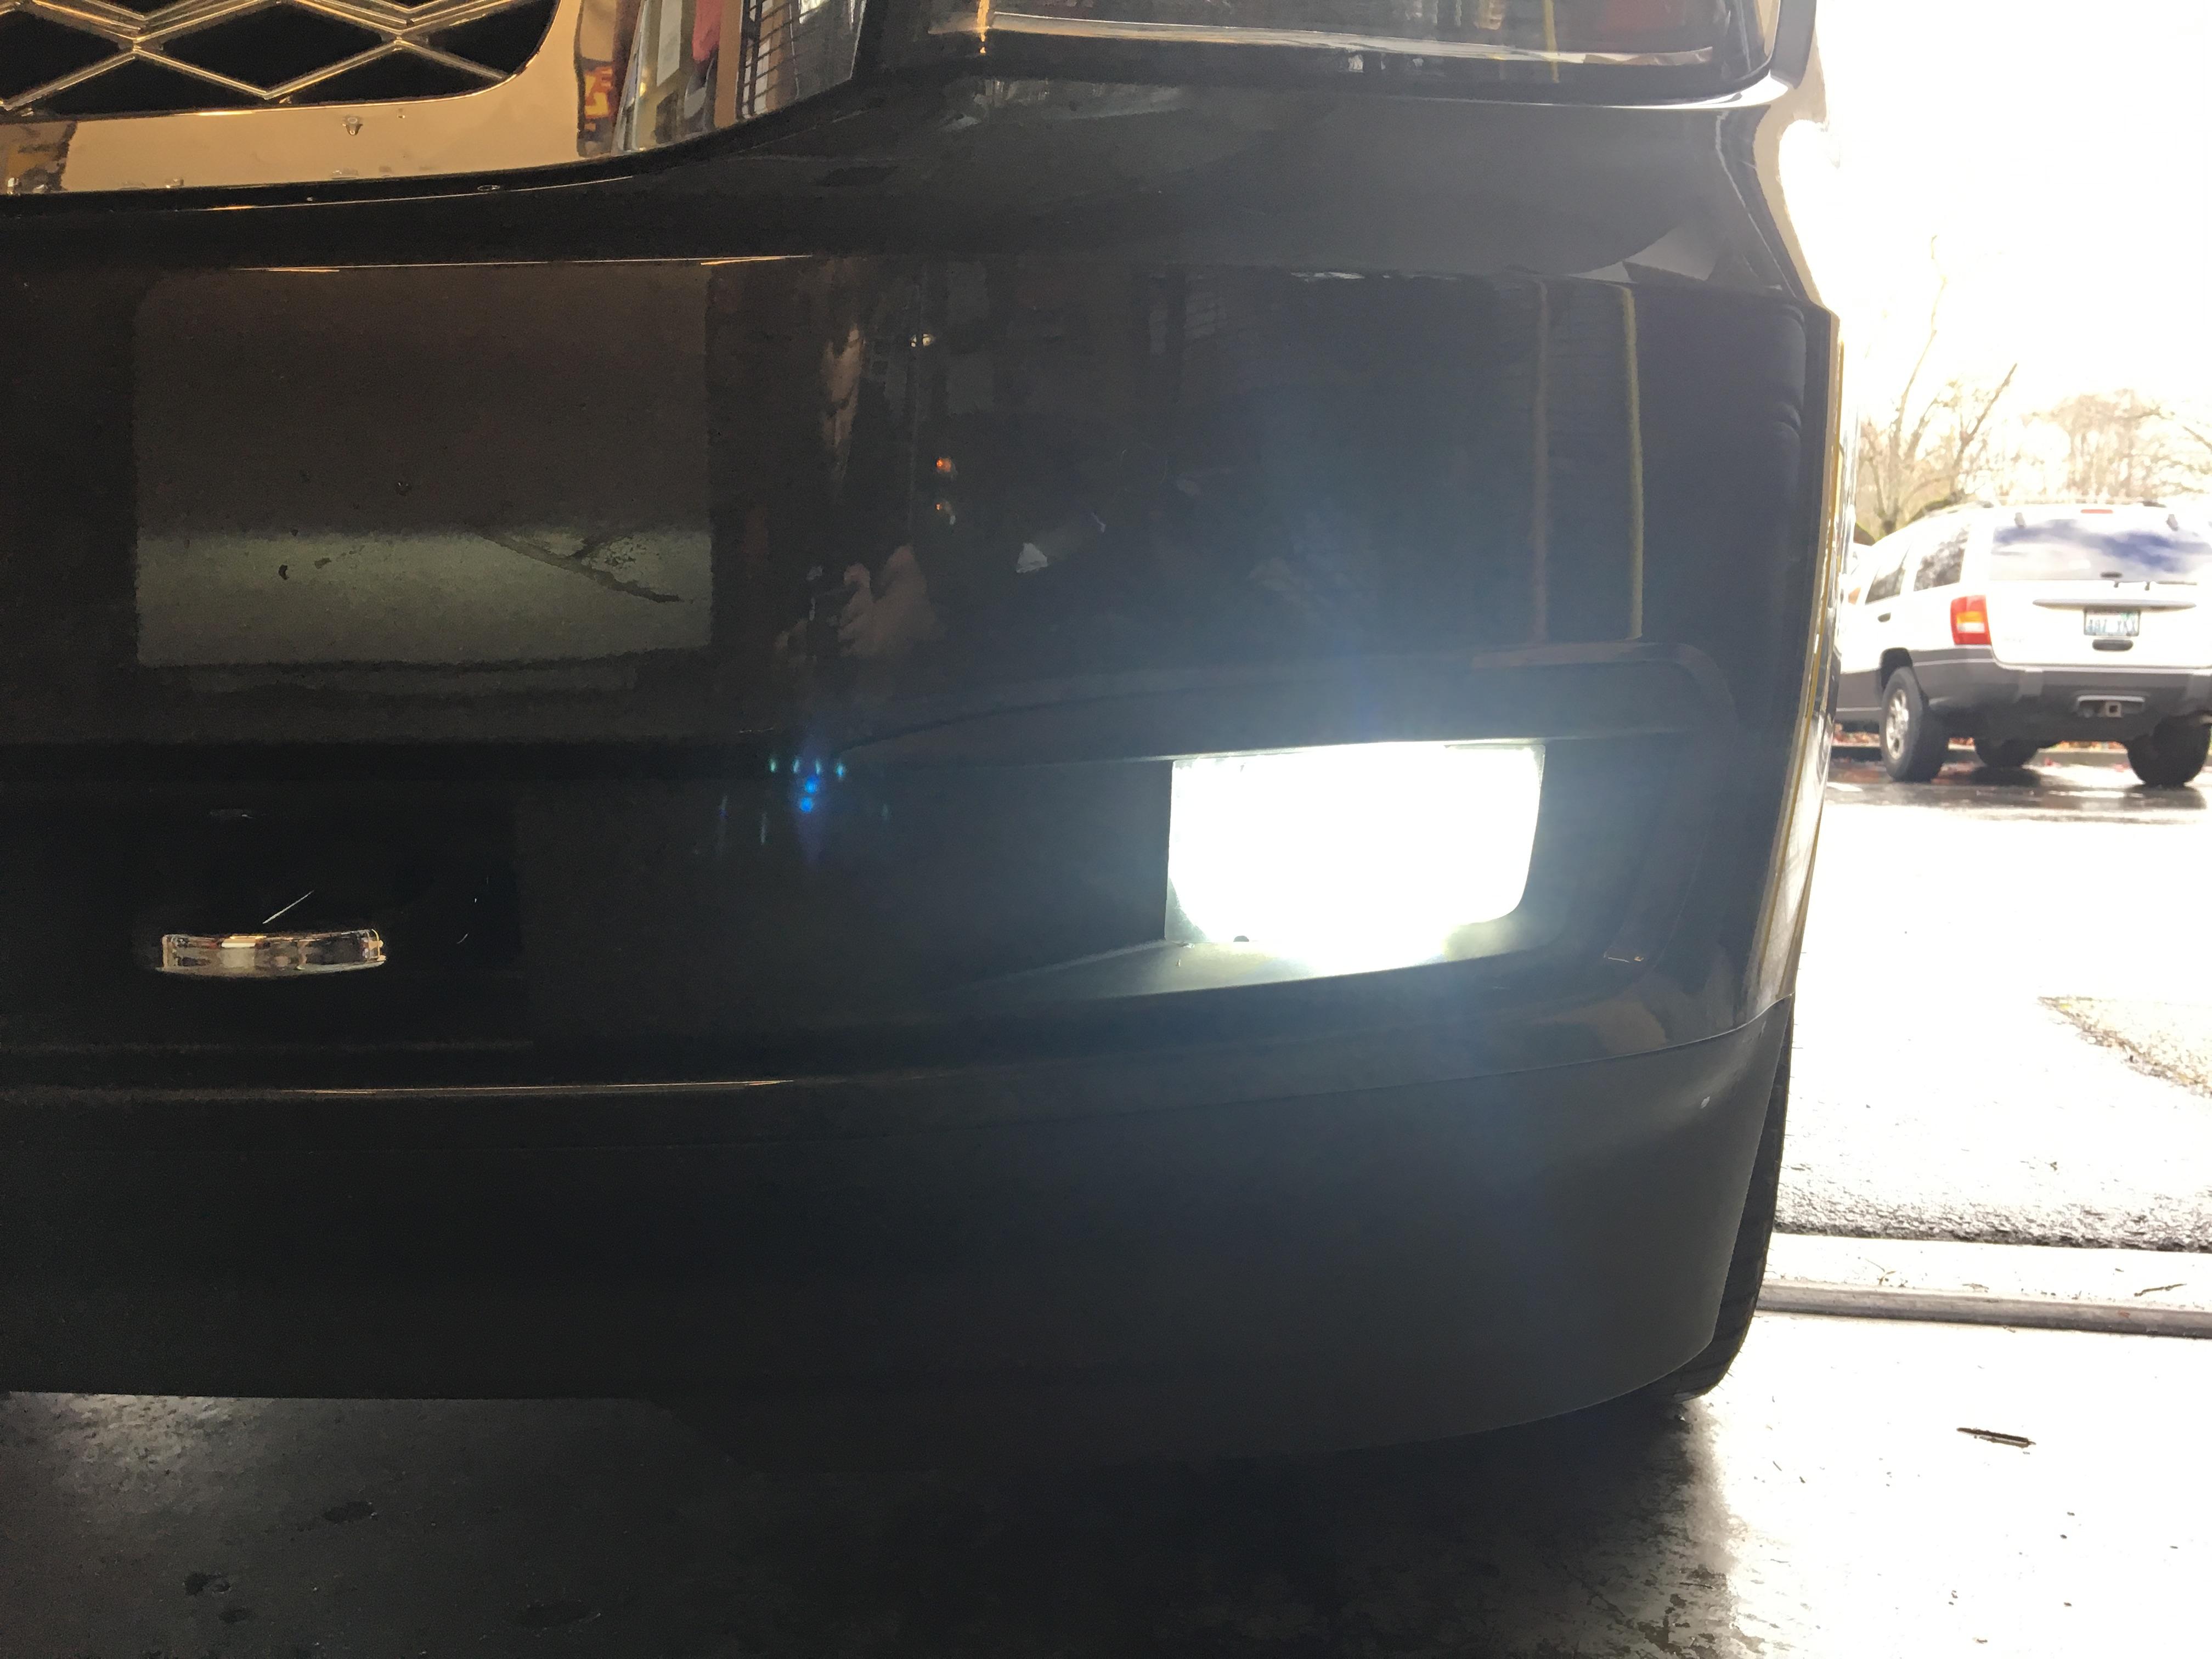 2015 2018 Chevy Tahoe Suburban Led Fog Lights Lw30 Cree Hid Kit Pros Silverado Light Wiring Harness